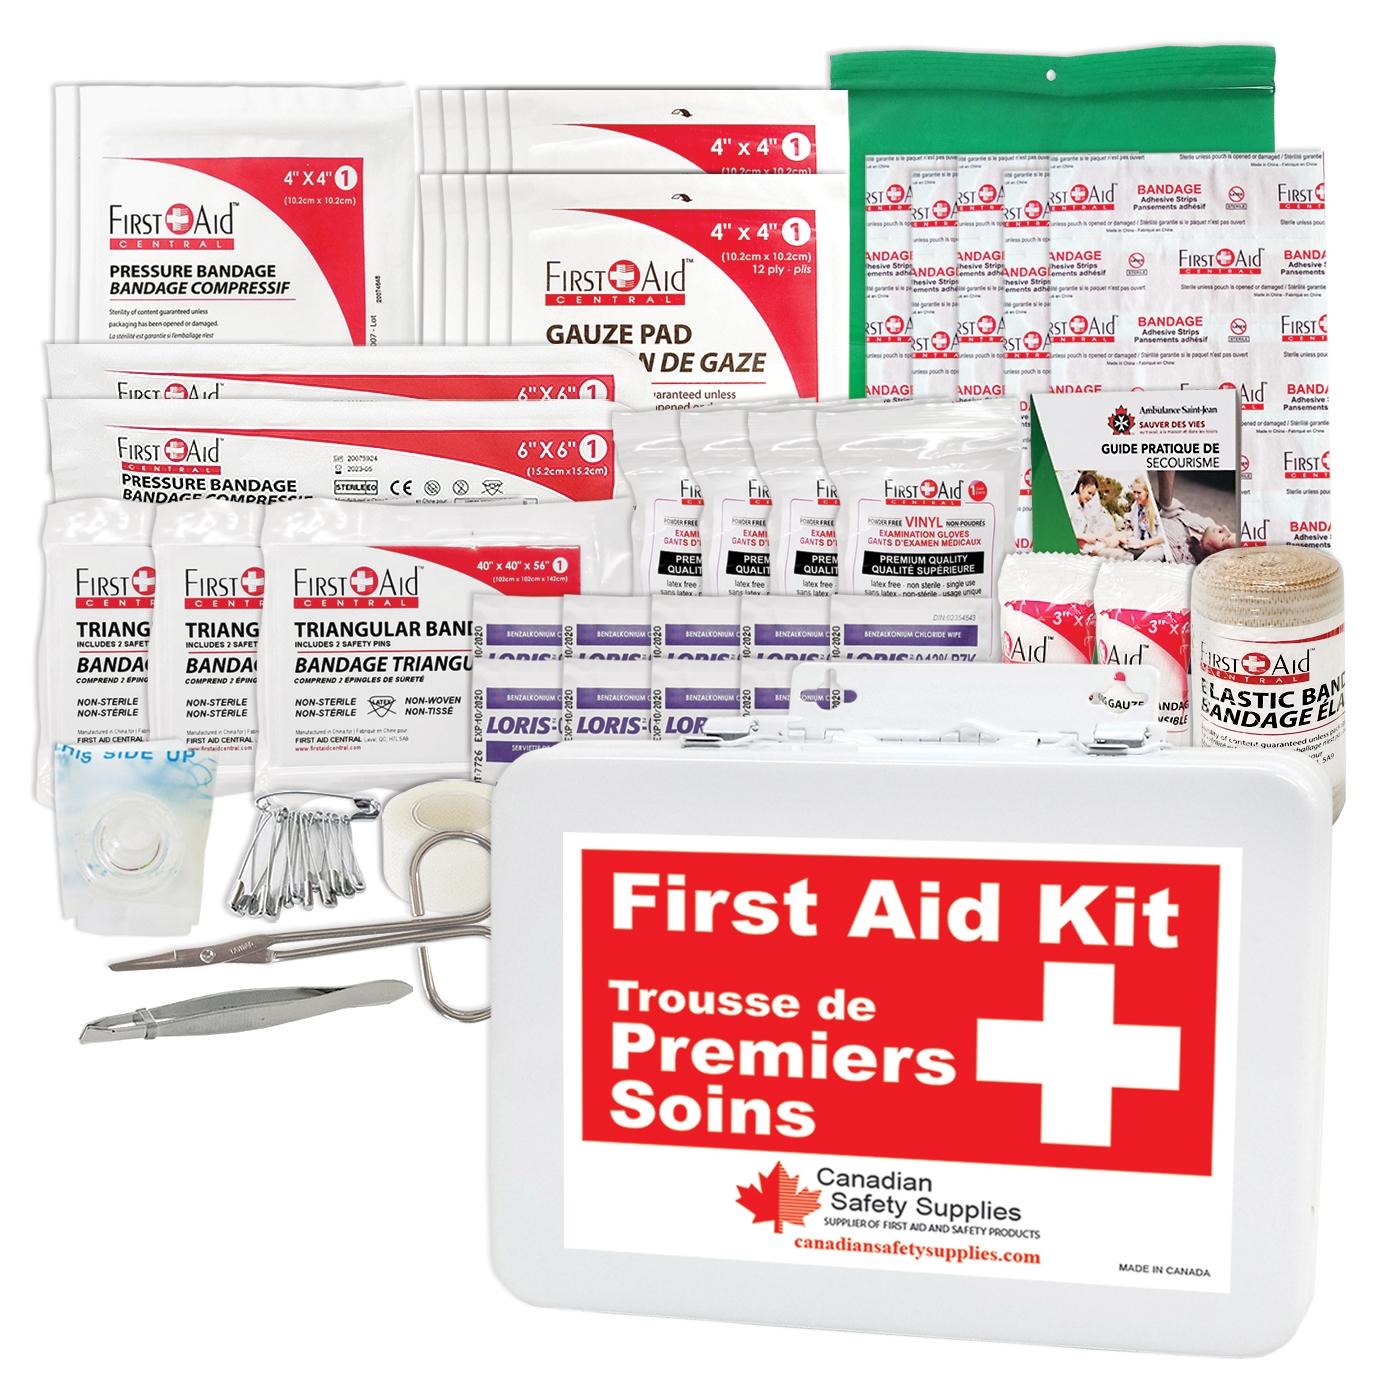 Yukon Level 1 First Aid Kit